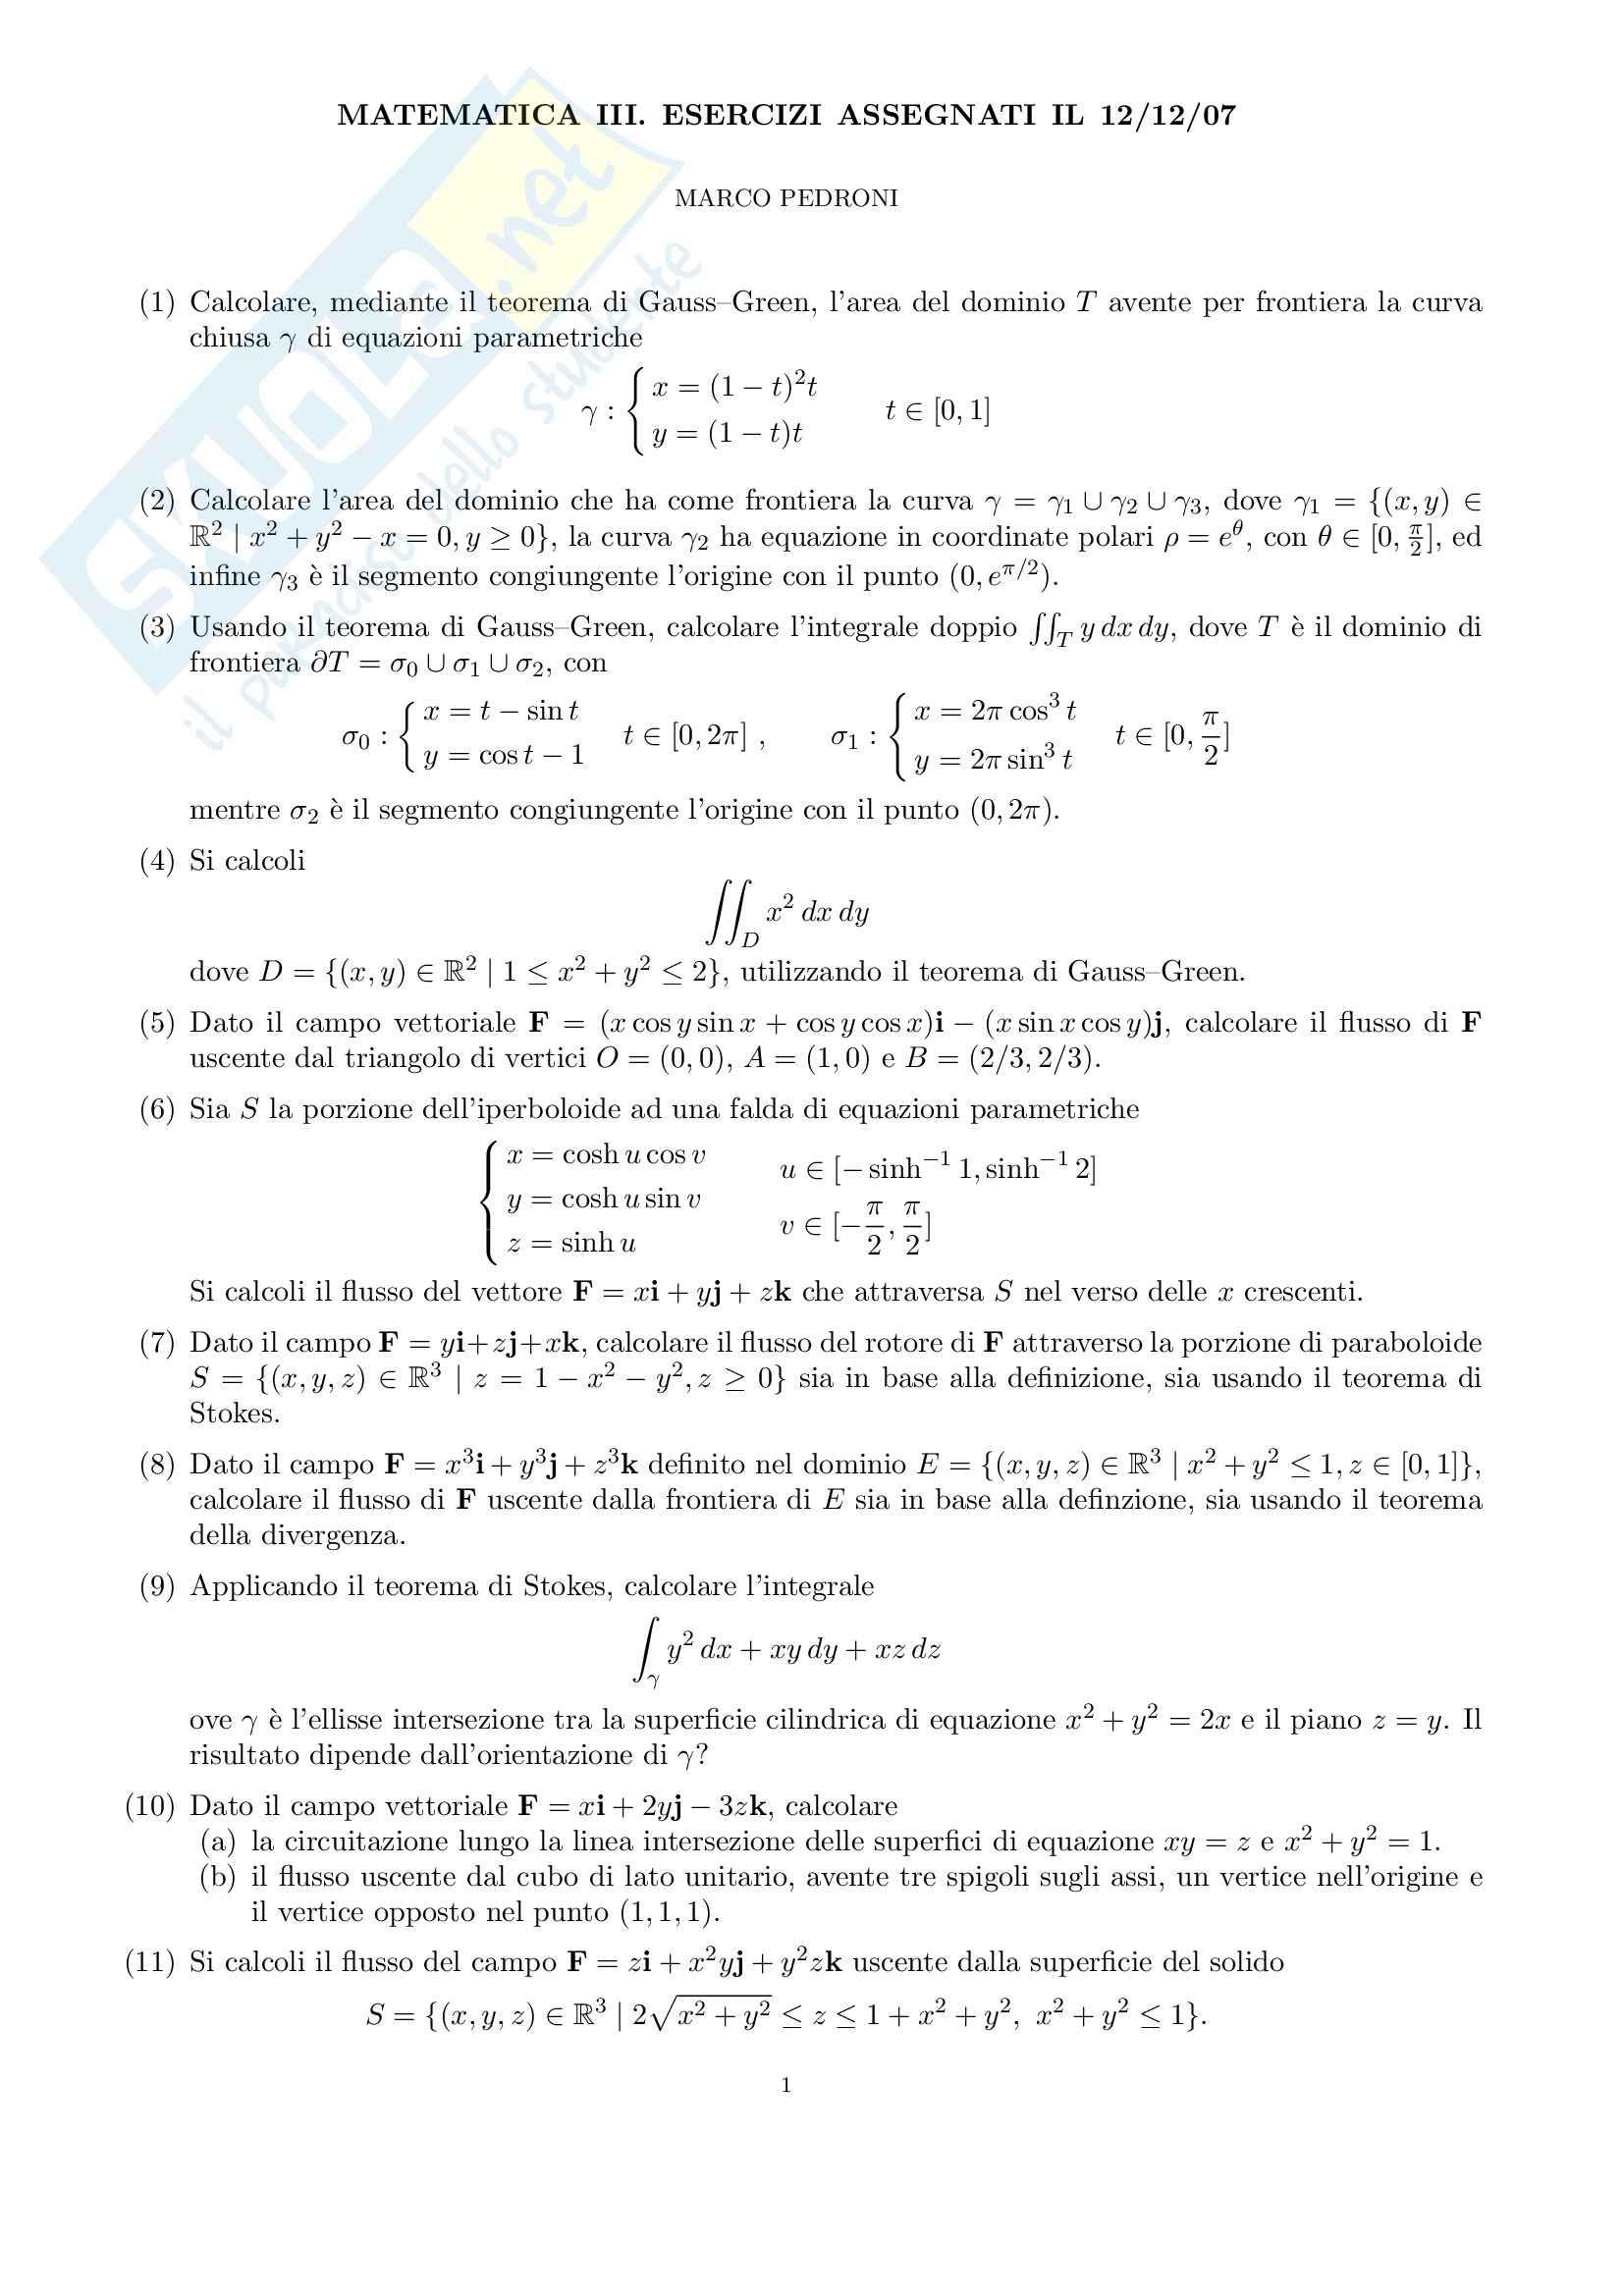 Analisi matematica II - Esercizi